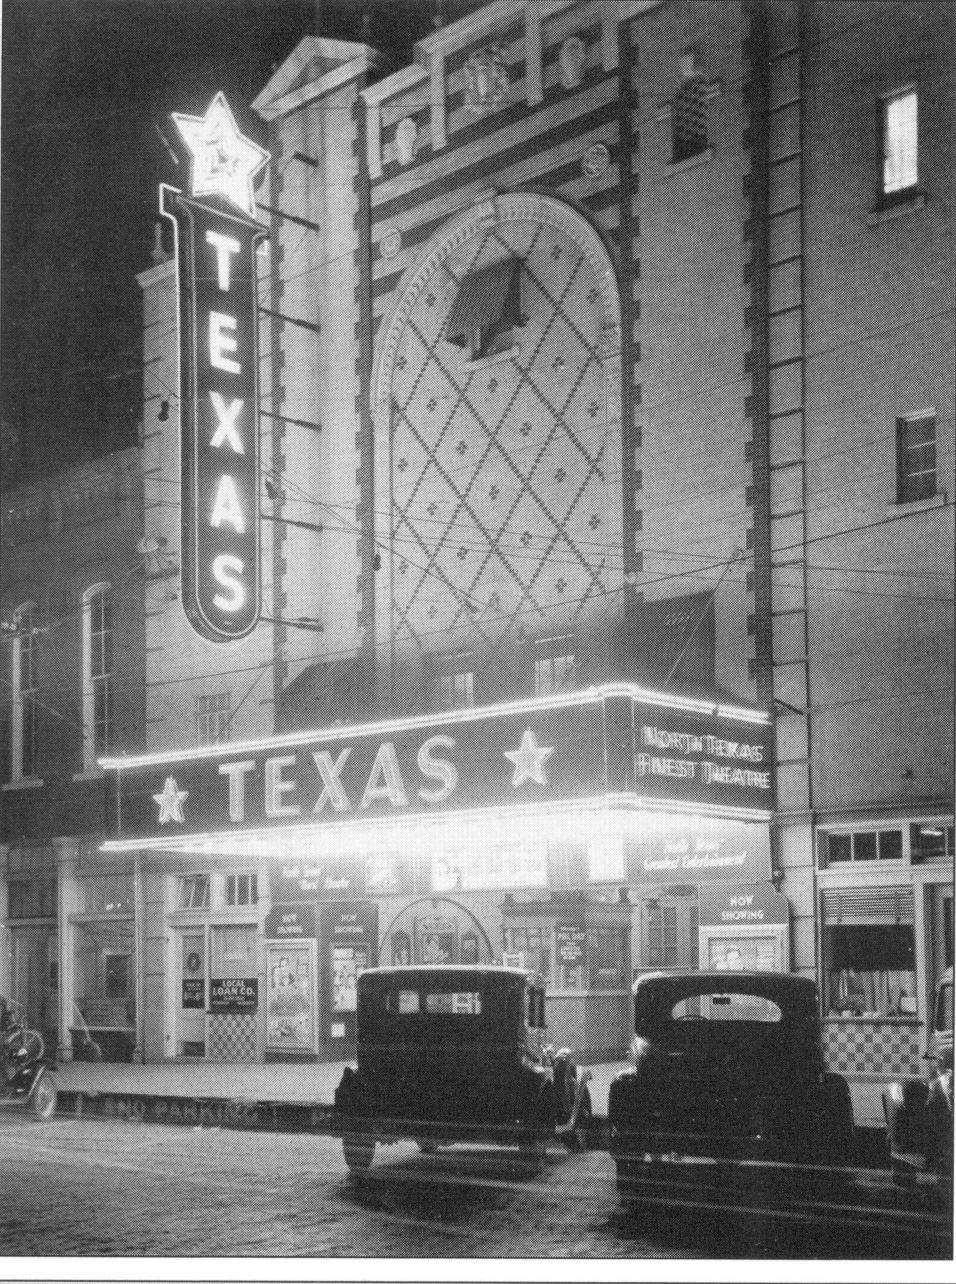 Texas Theater - 1920's